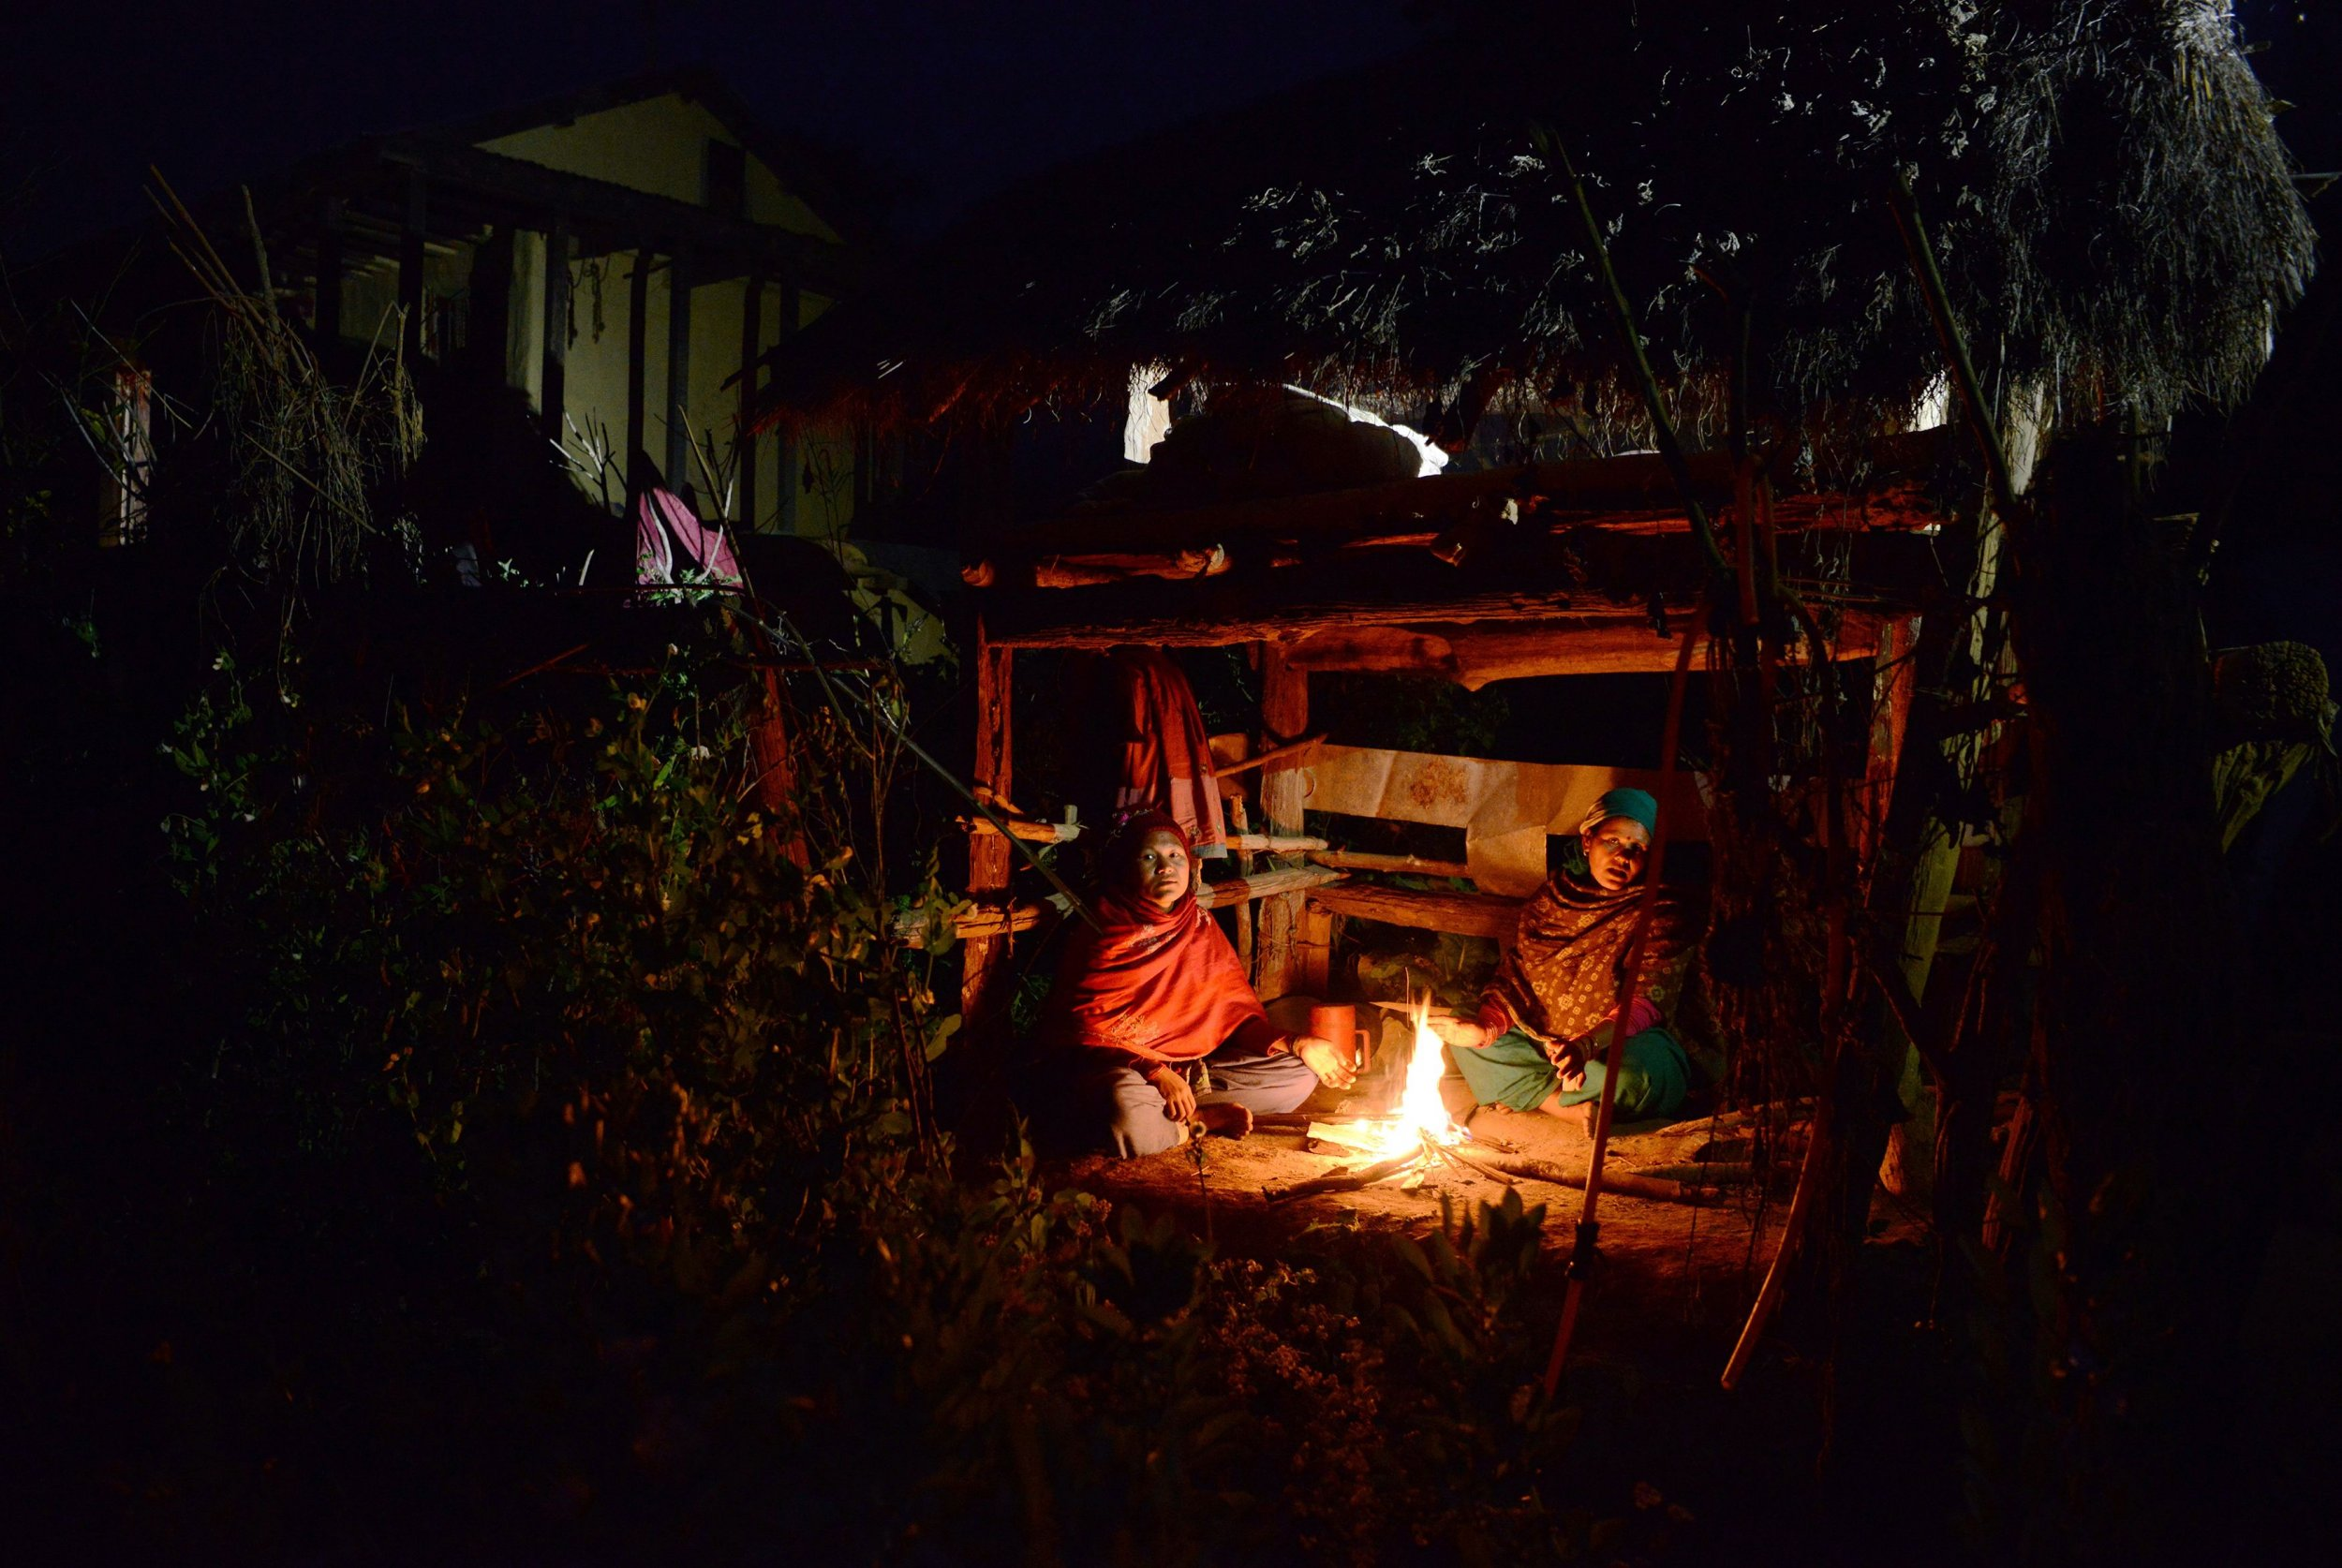 Menstruation hut, Death, Fire, Nepal, Period, Chhaupadi